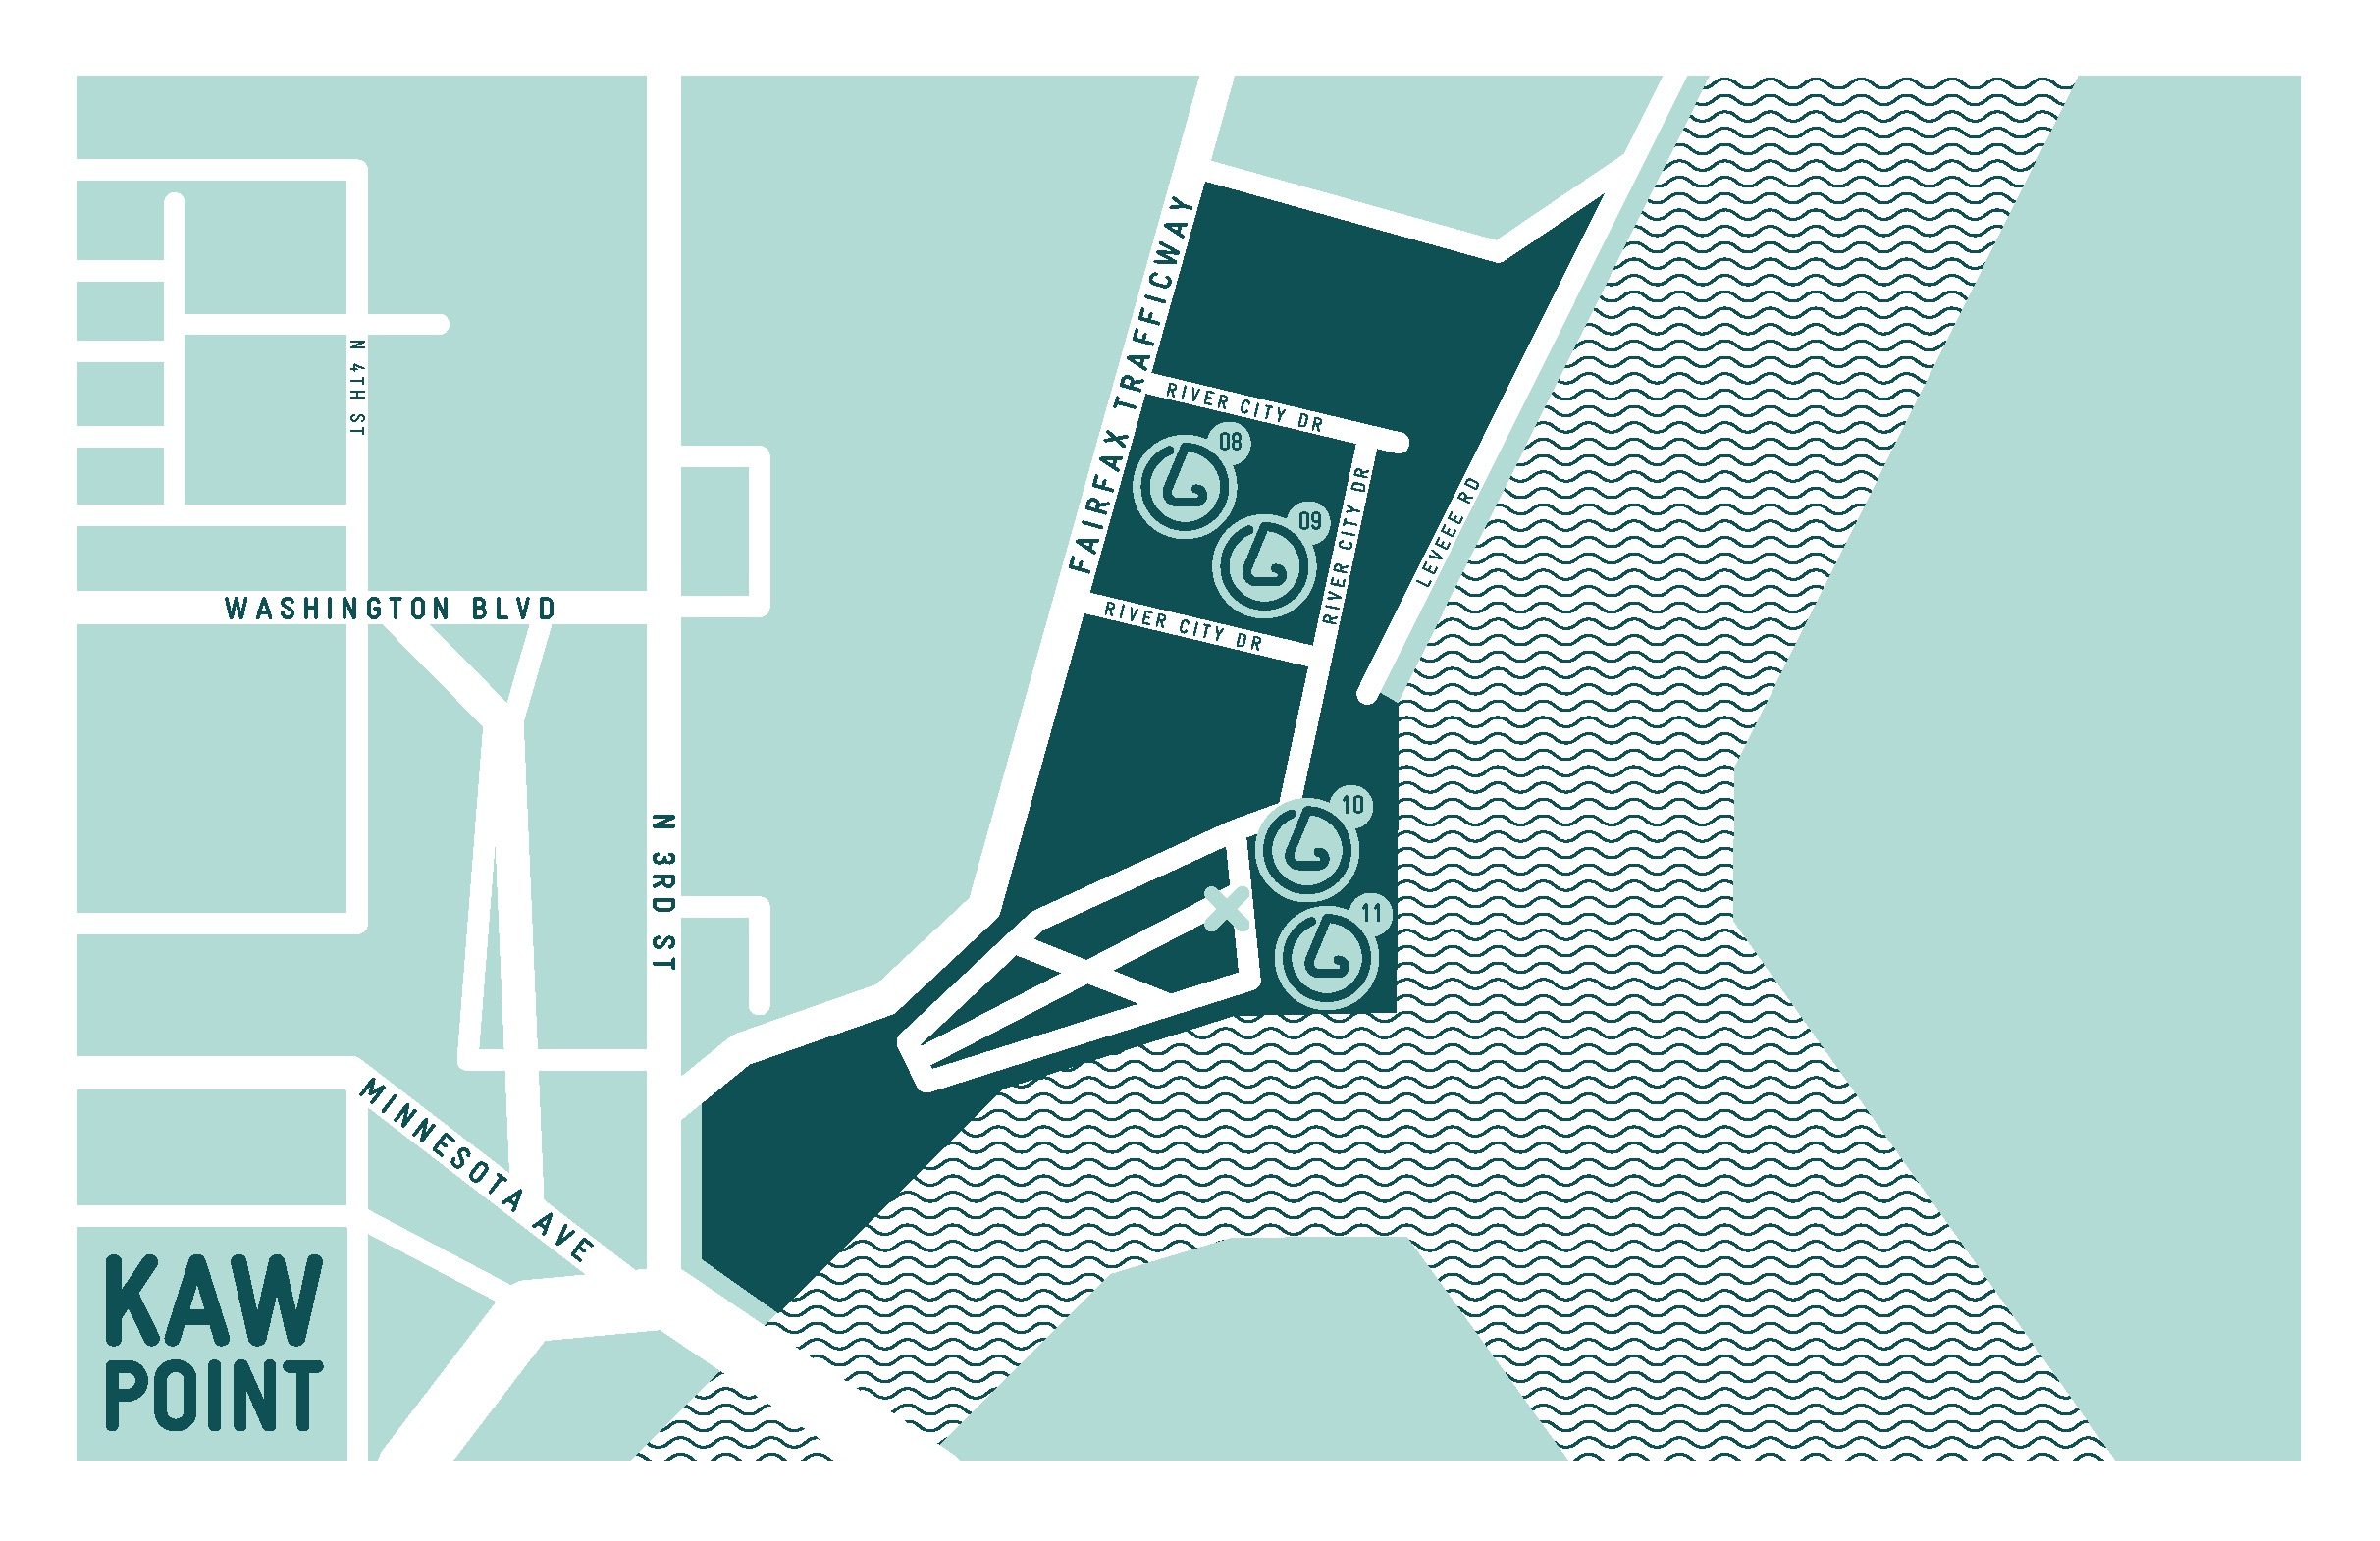 Kaw Point neighborhood map,  SmellScape KCK/KCMO , 2012.(design © Novamondo)